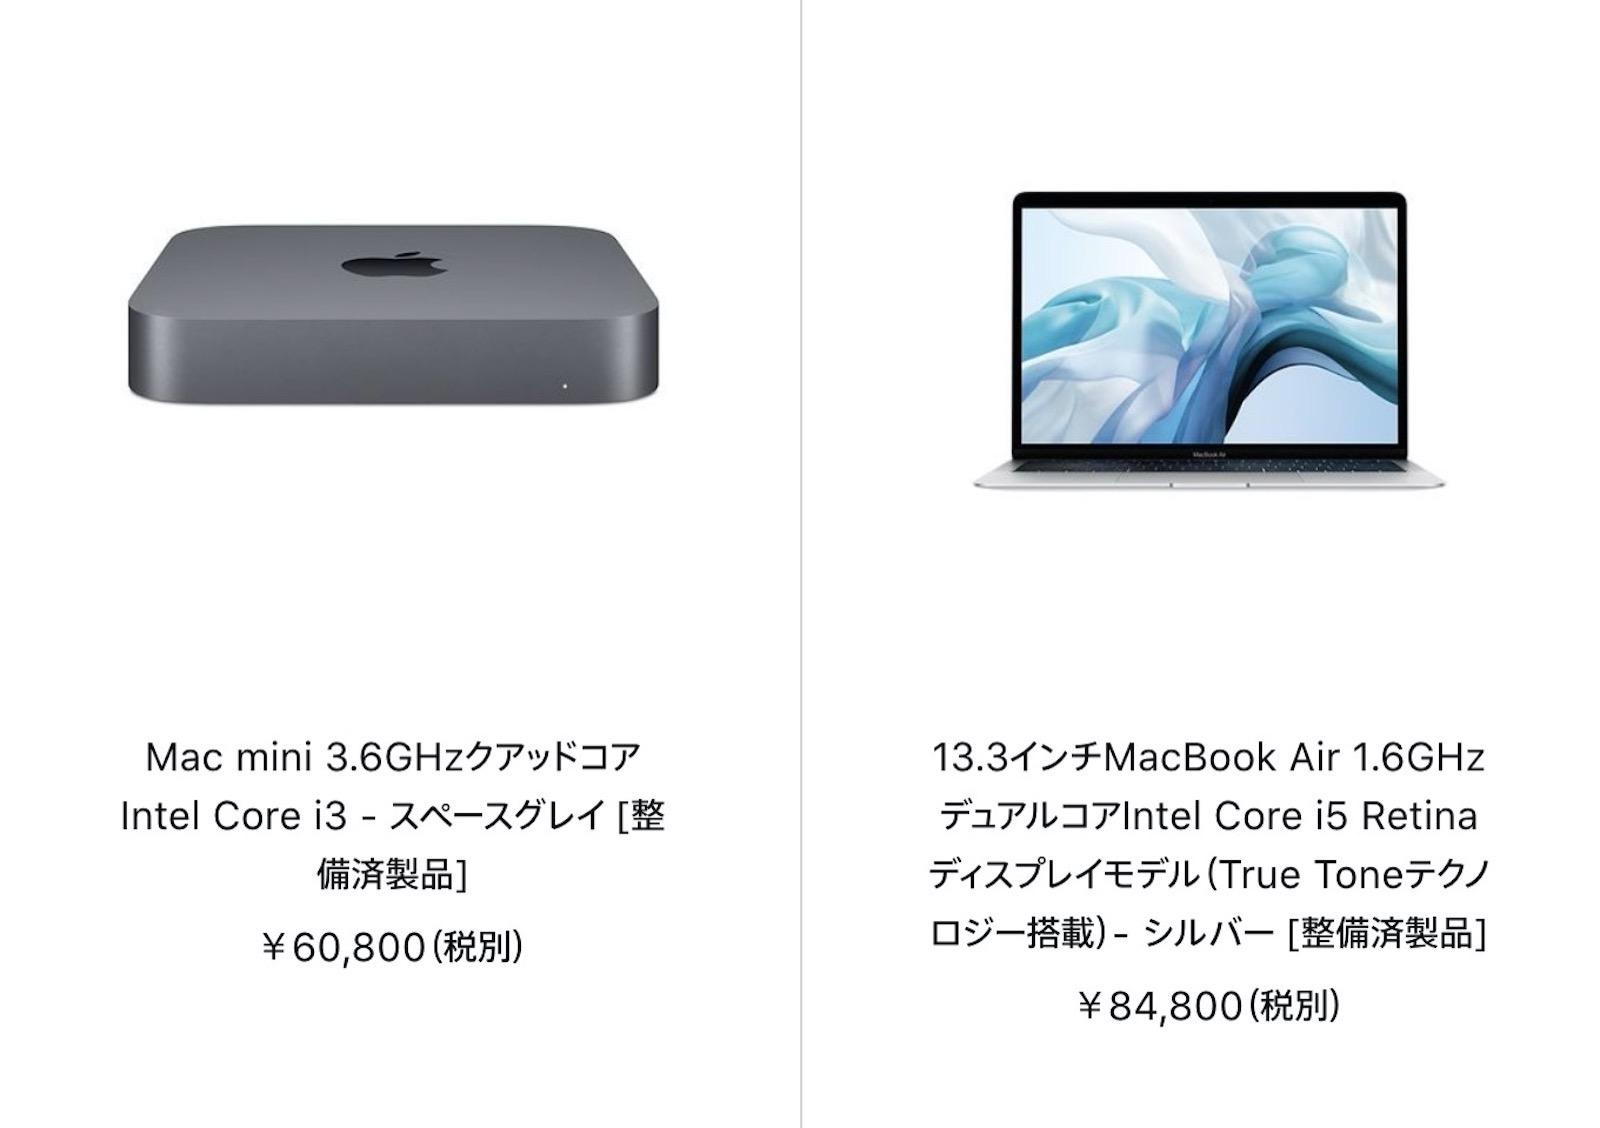 Macbook air and mac mini refurbished